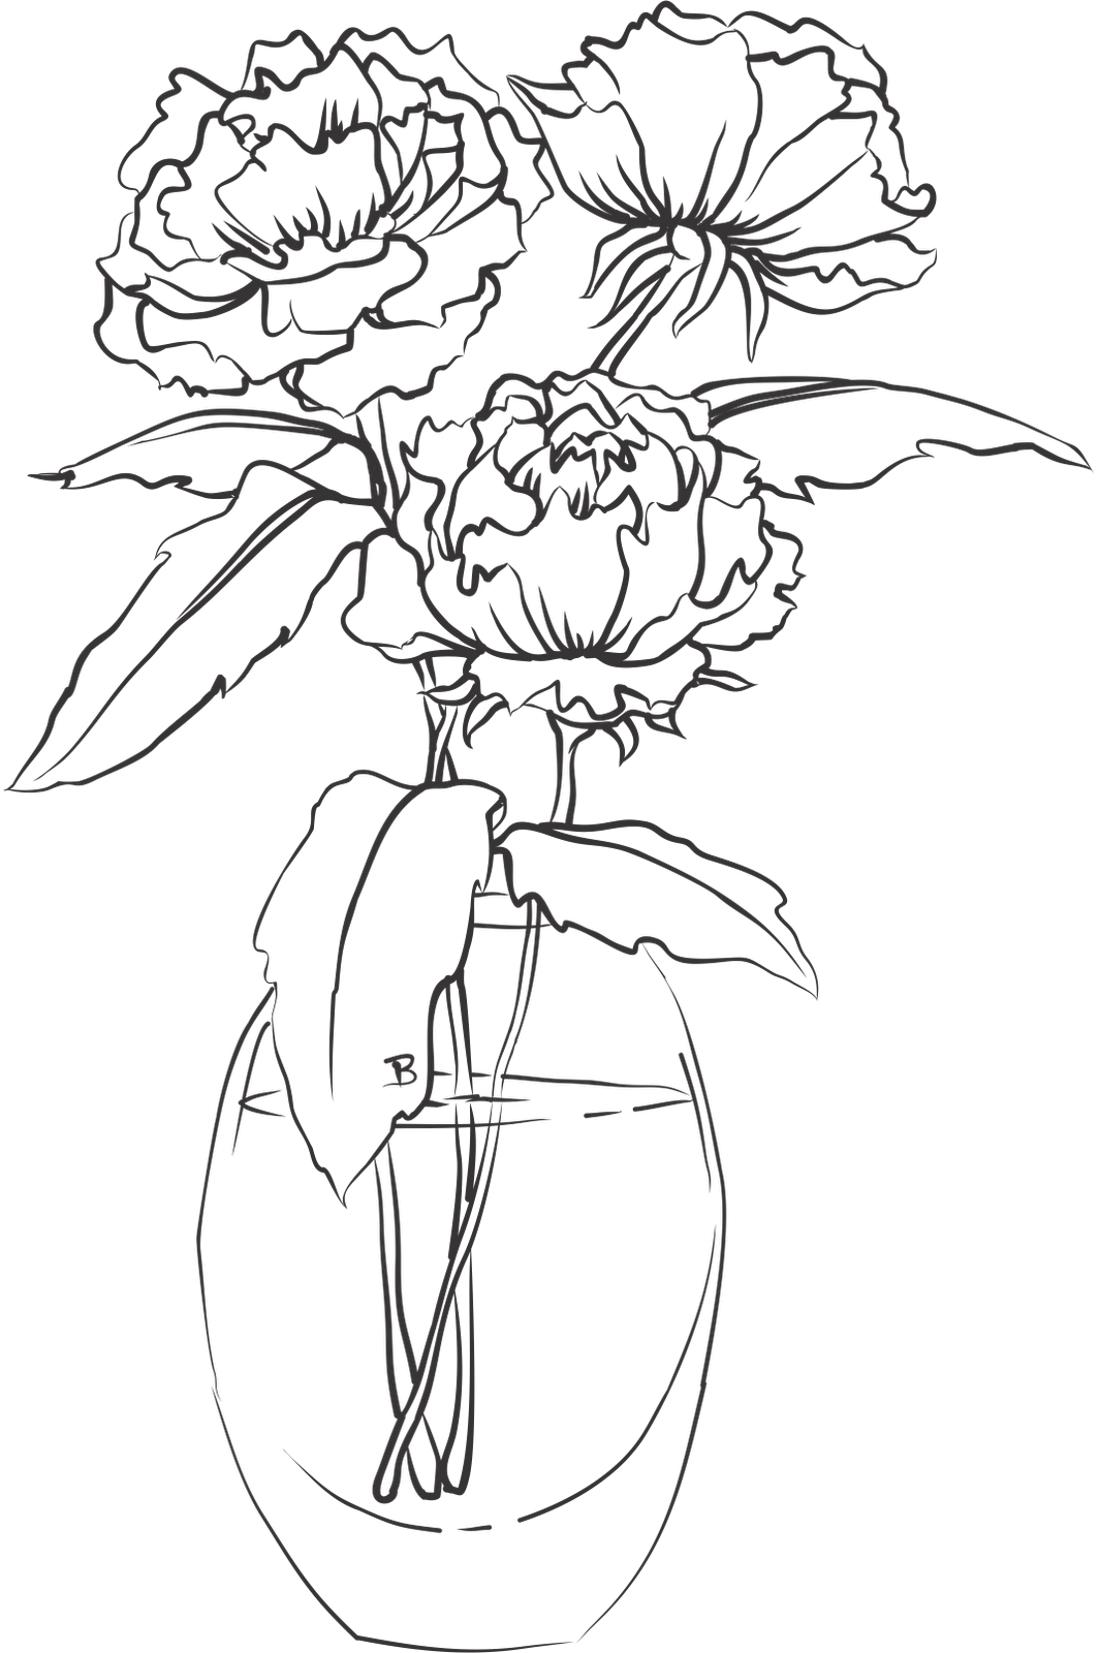 Раскраска цветок пионы